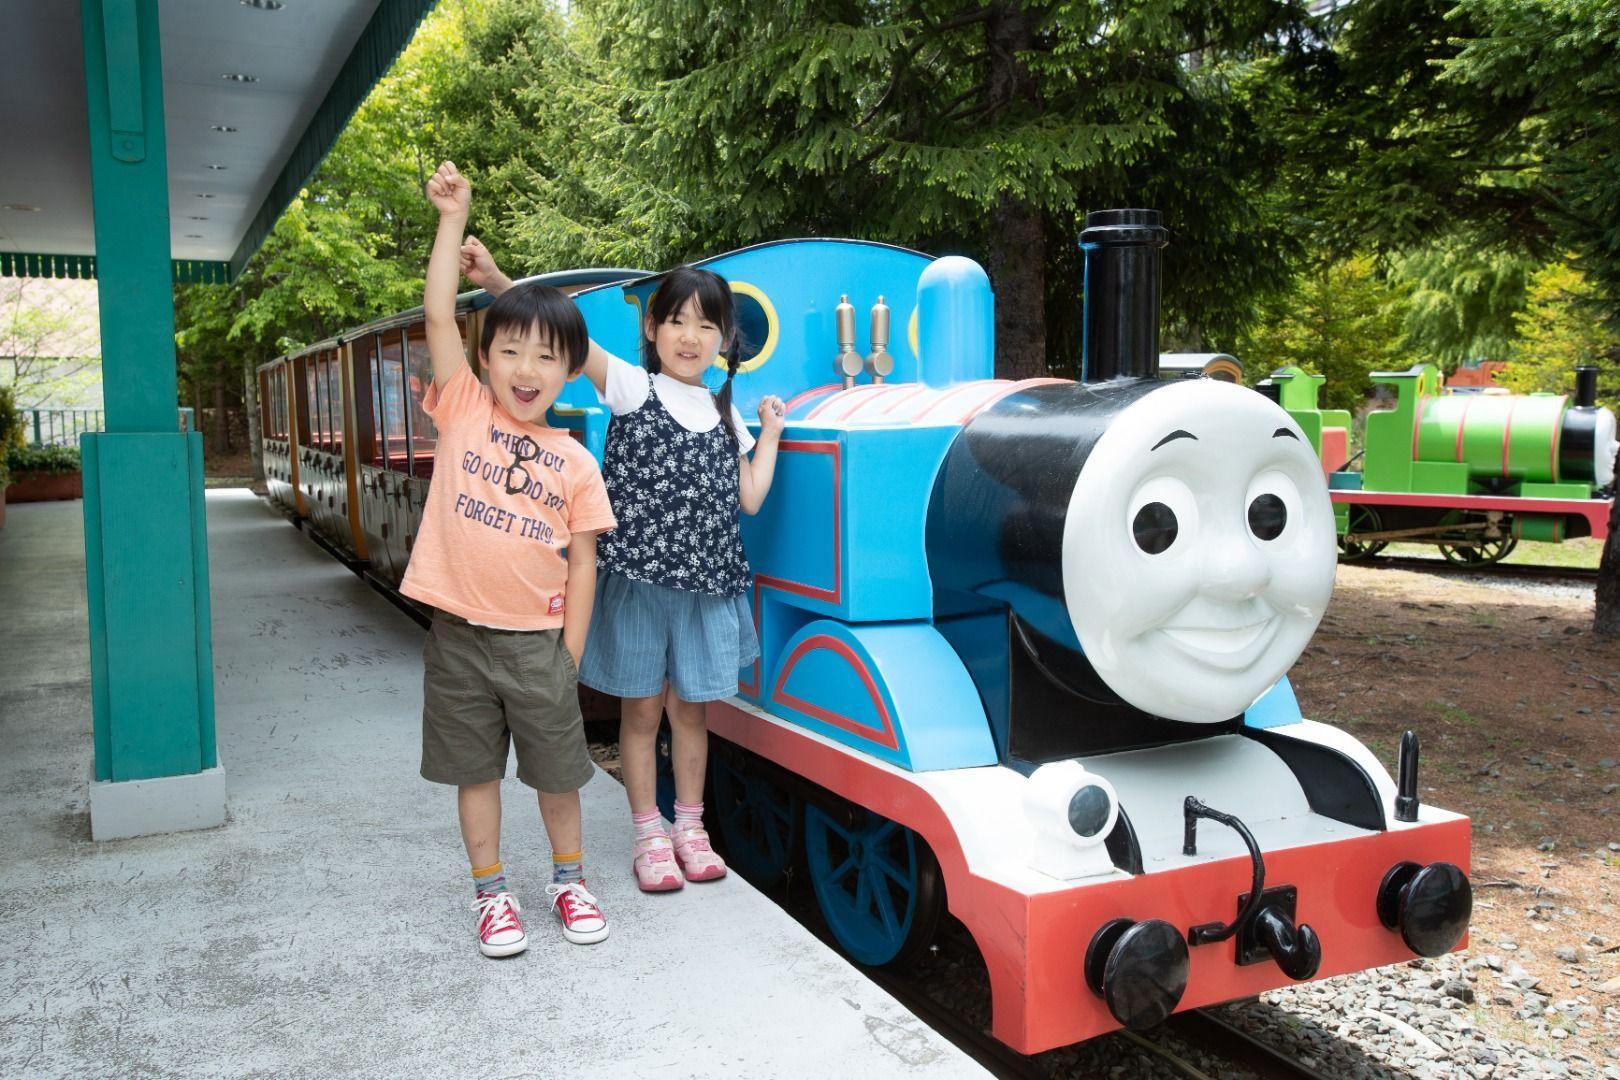 Thomas and Percy's Fun Ride